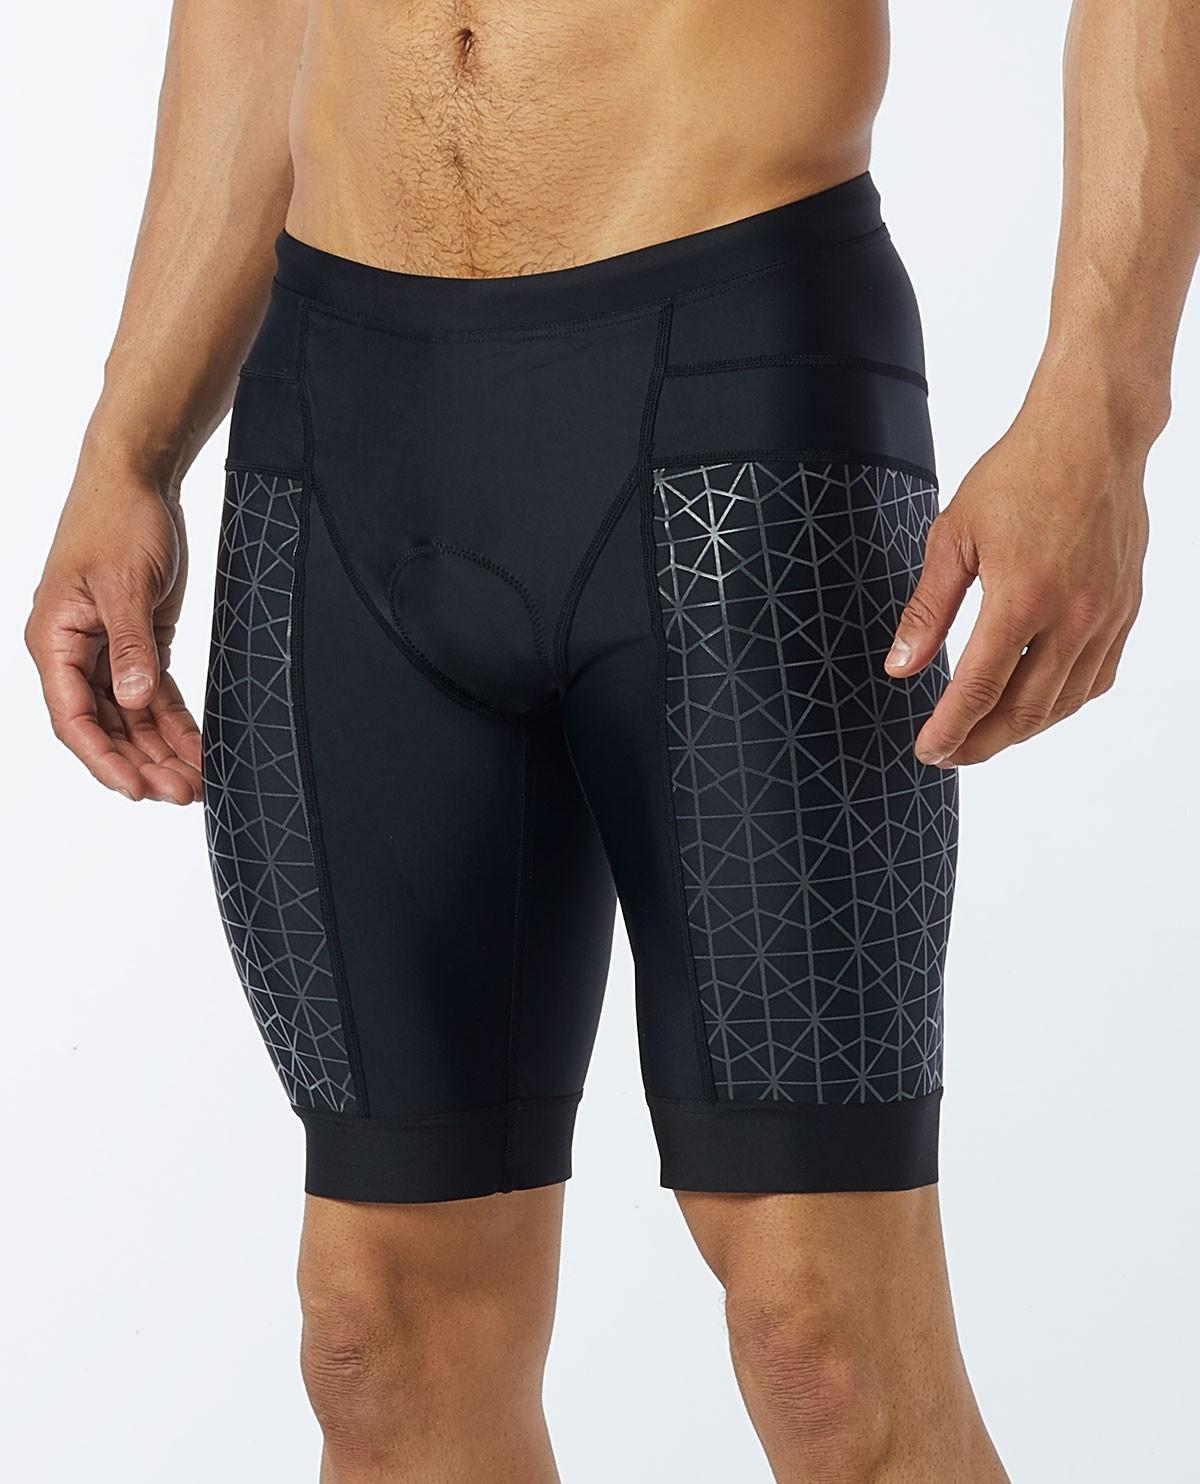 7 shorts vs 9 shorts